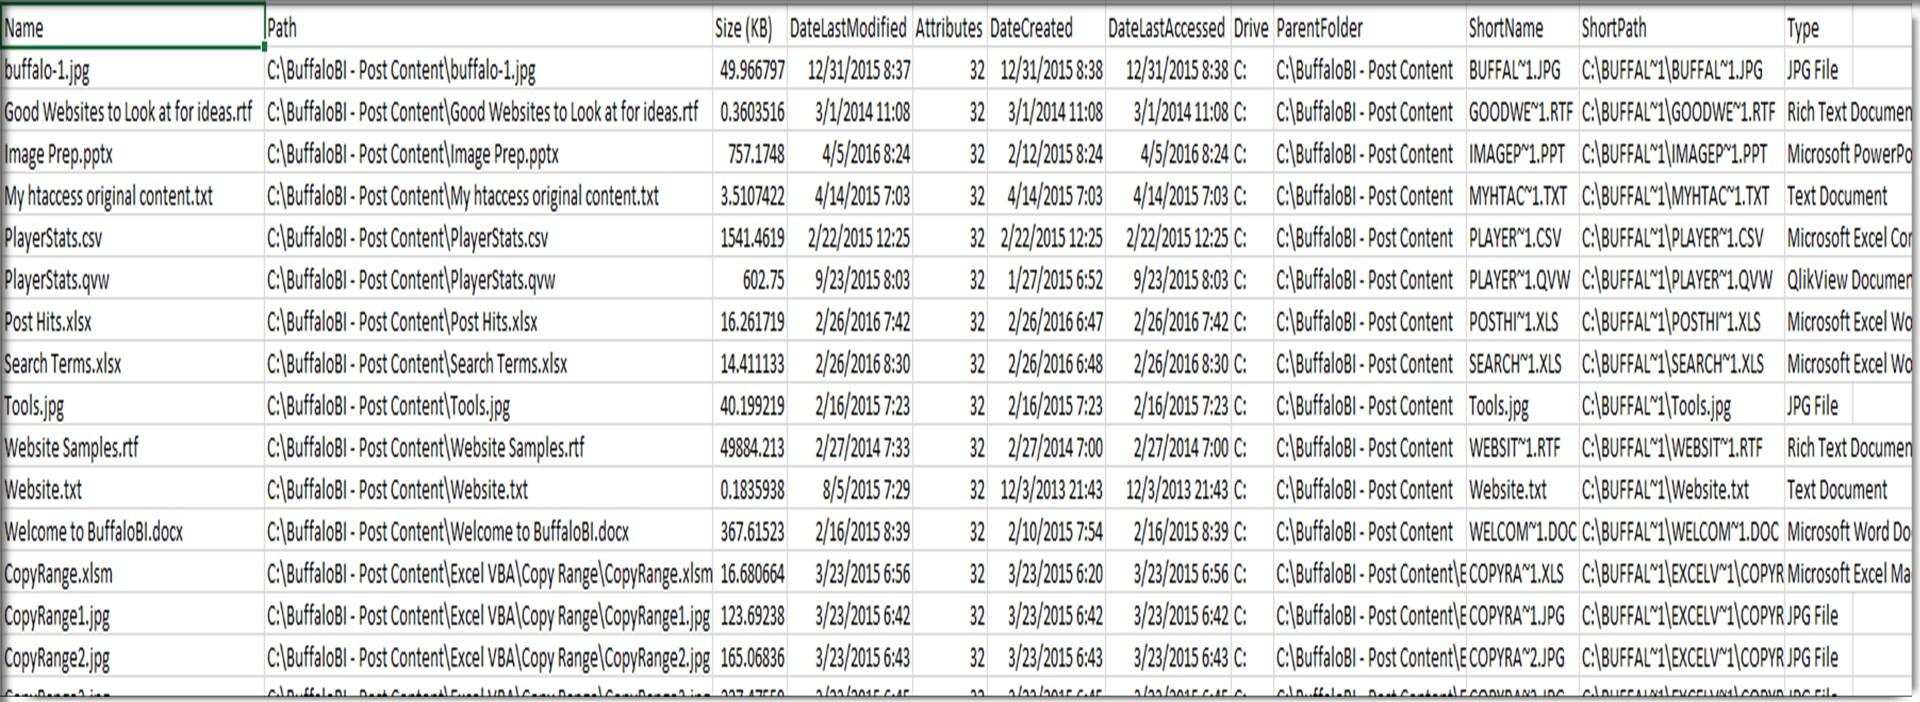 Excel VBA List Files in Folders and Subfolders - BuffaloBI com